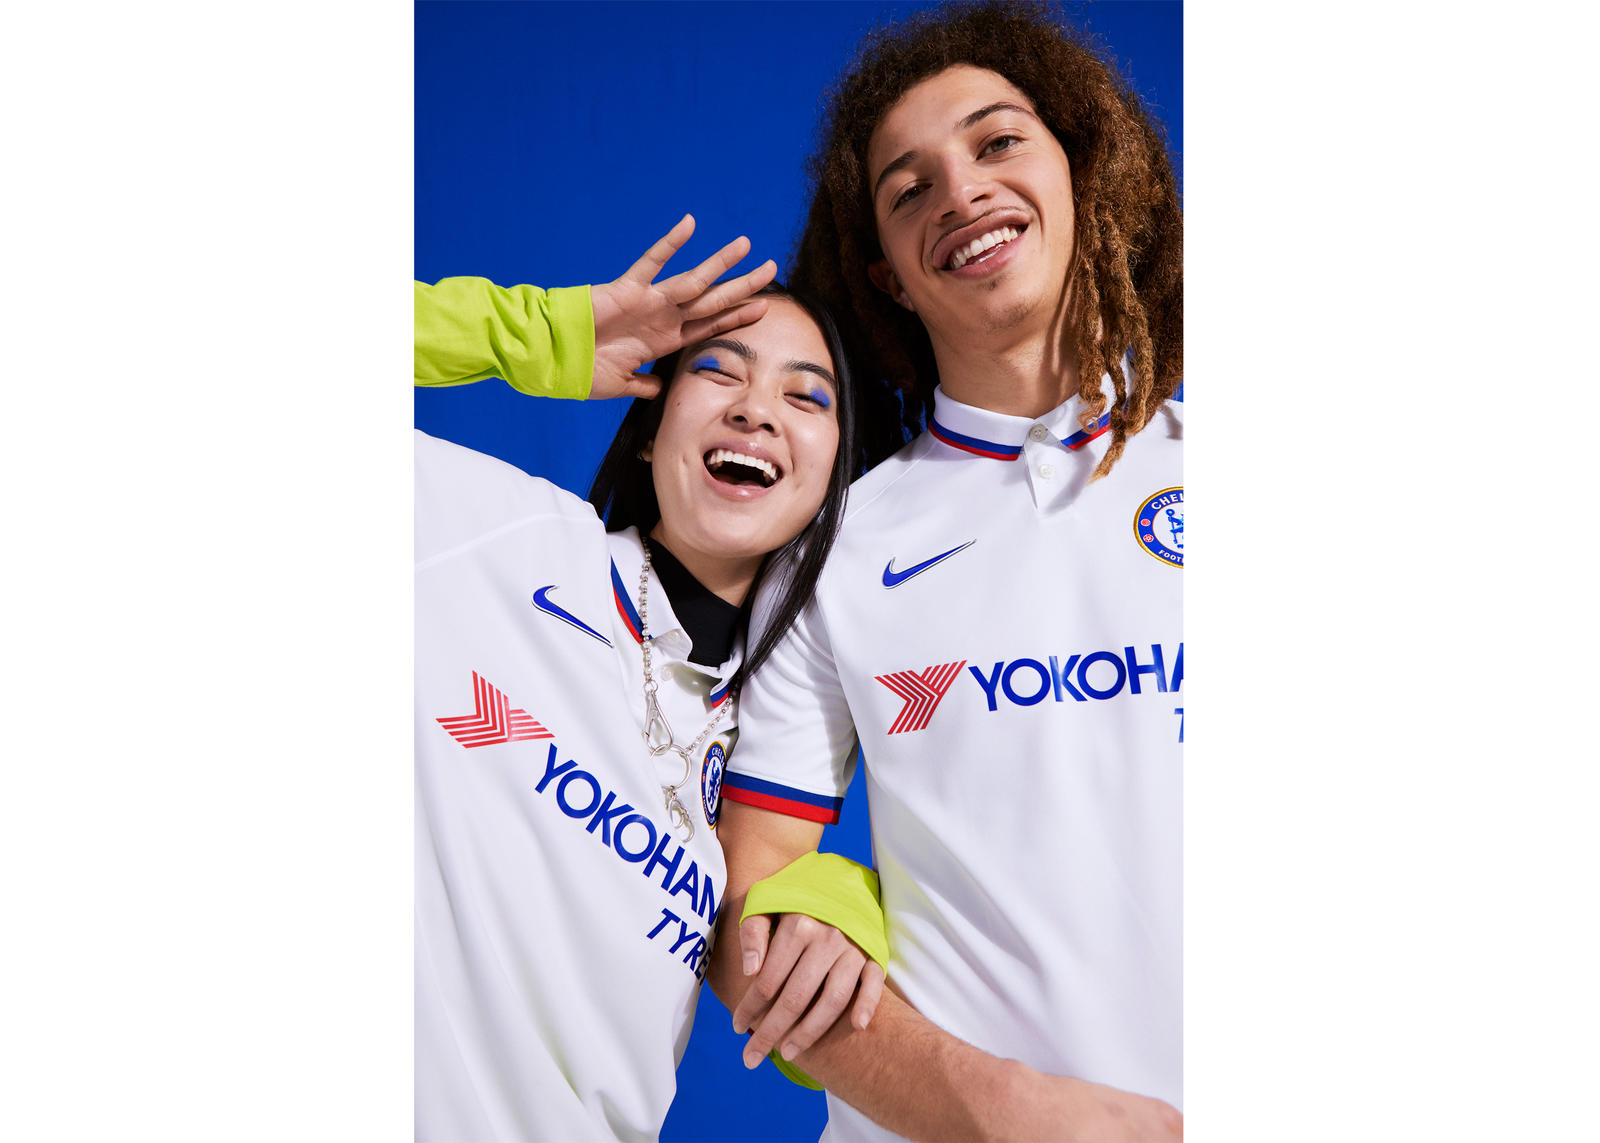 Chelsea-Away-Jersey-Nike-News-3_89132